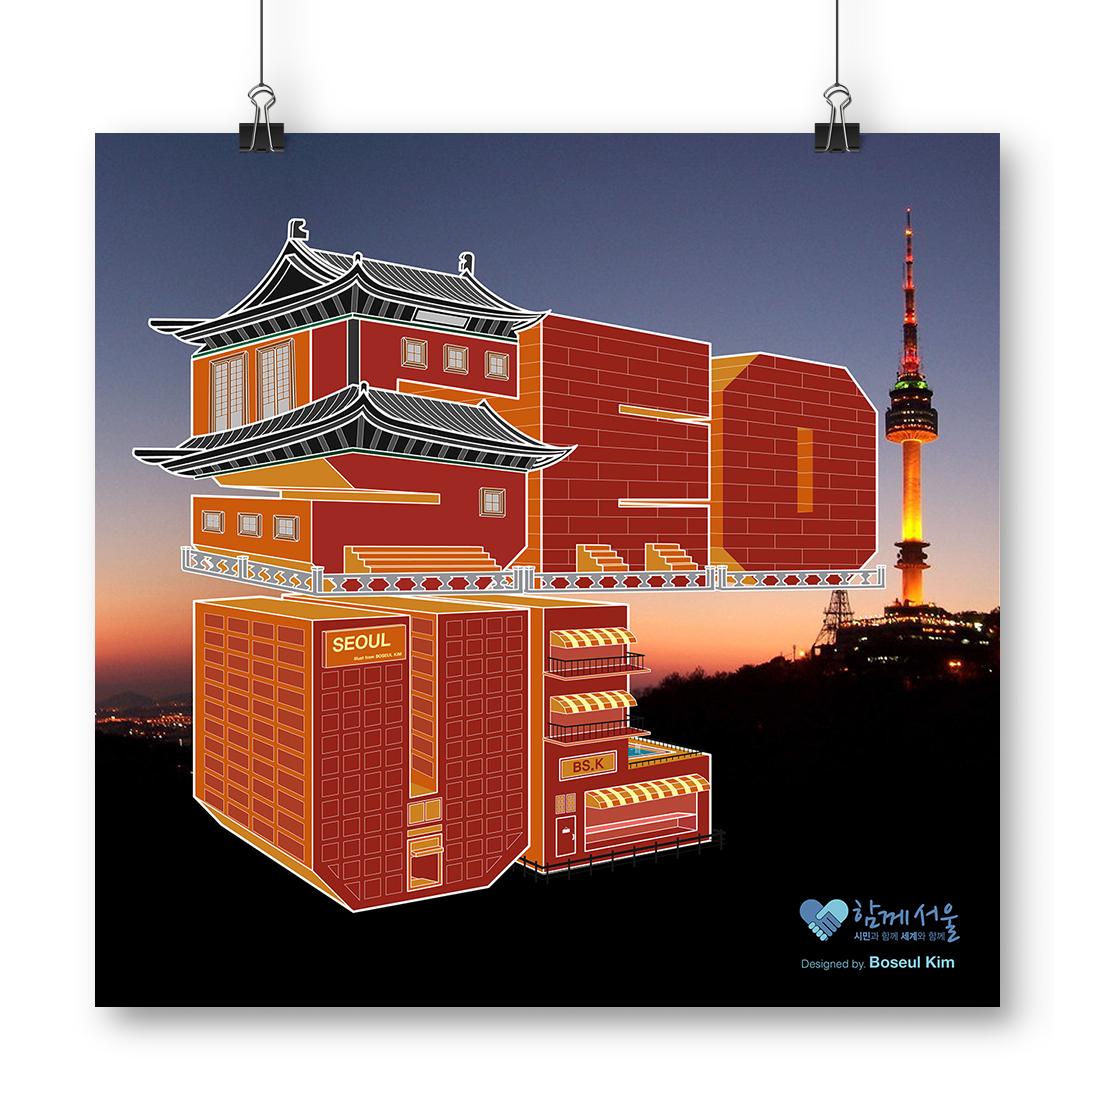 Seoul Typography Contest - Boseul Kim